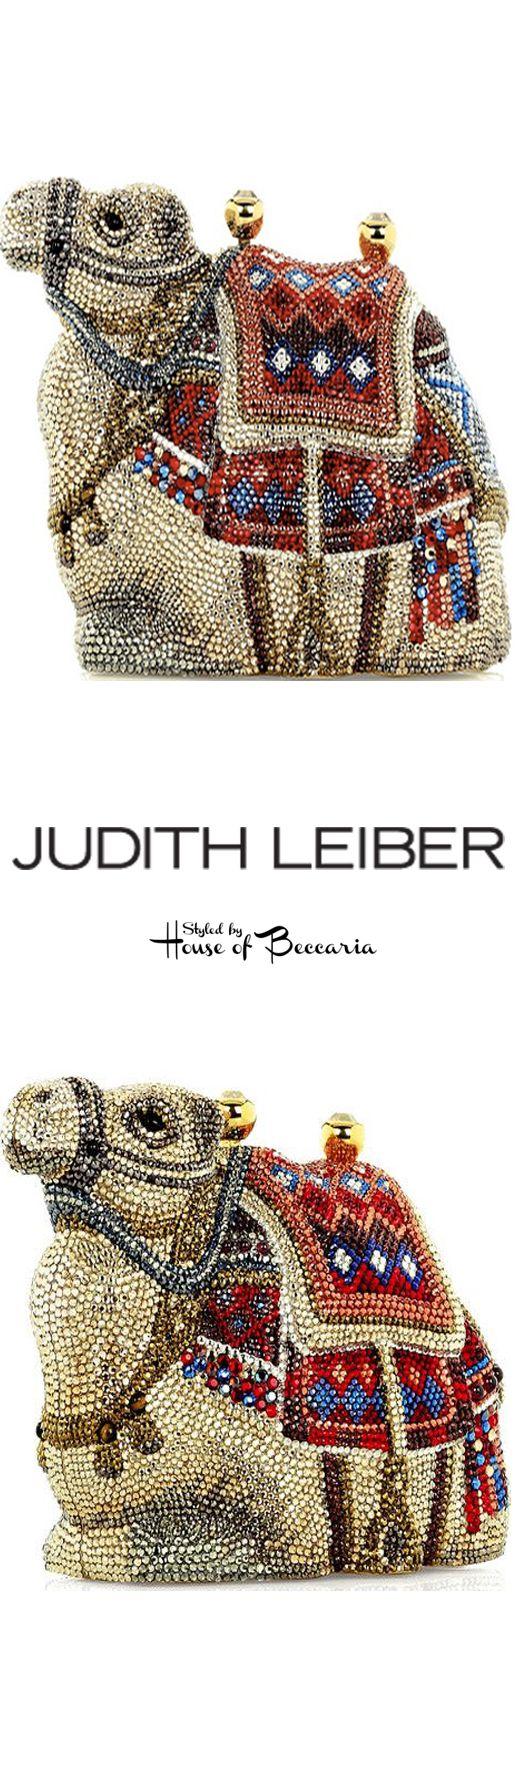 ~Judith Leiber Gobi Crystal - Embellished Camel Clutch   House of Beccaria